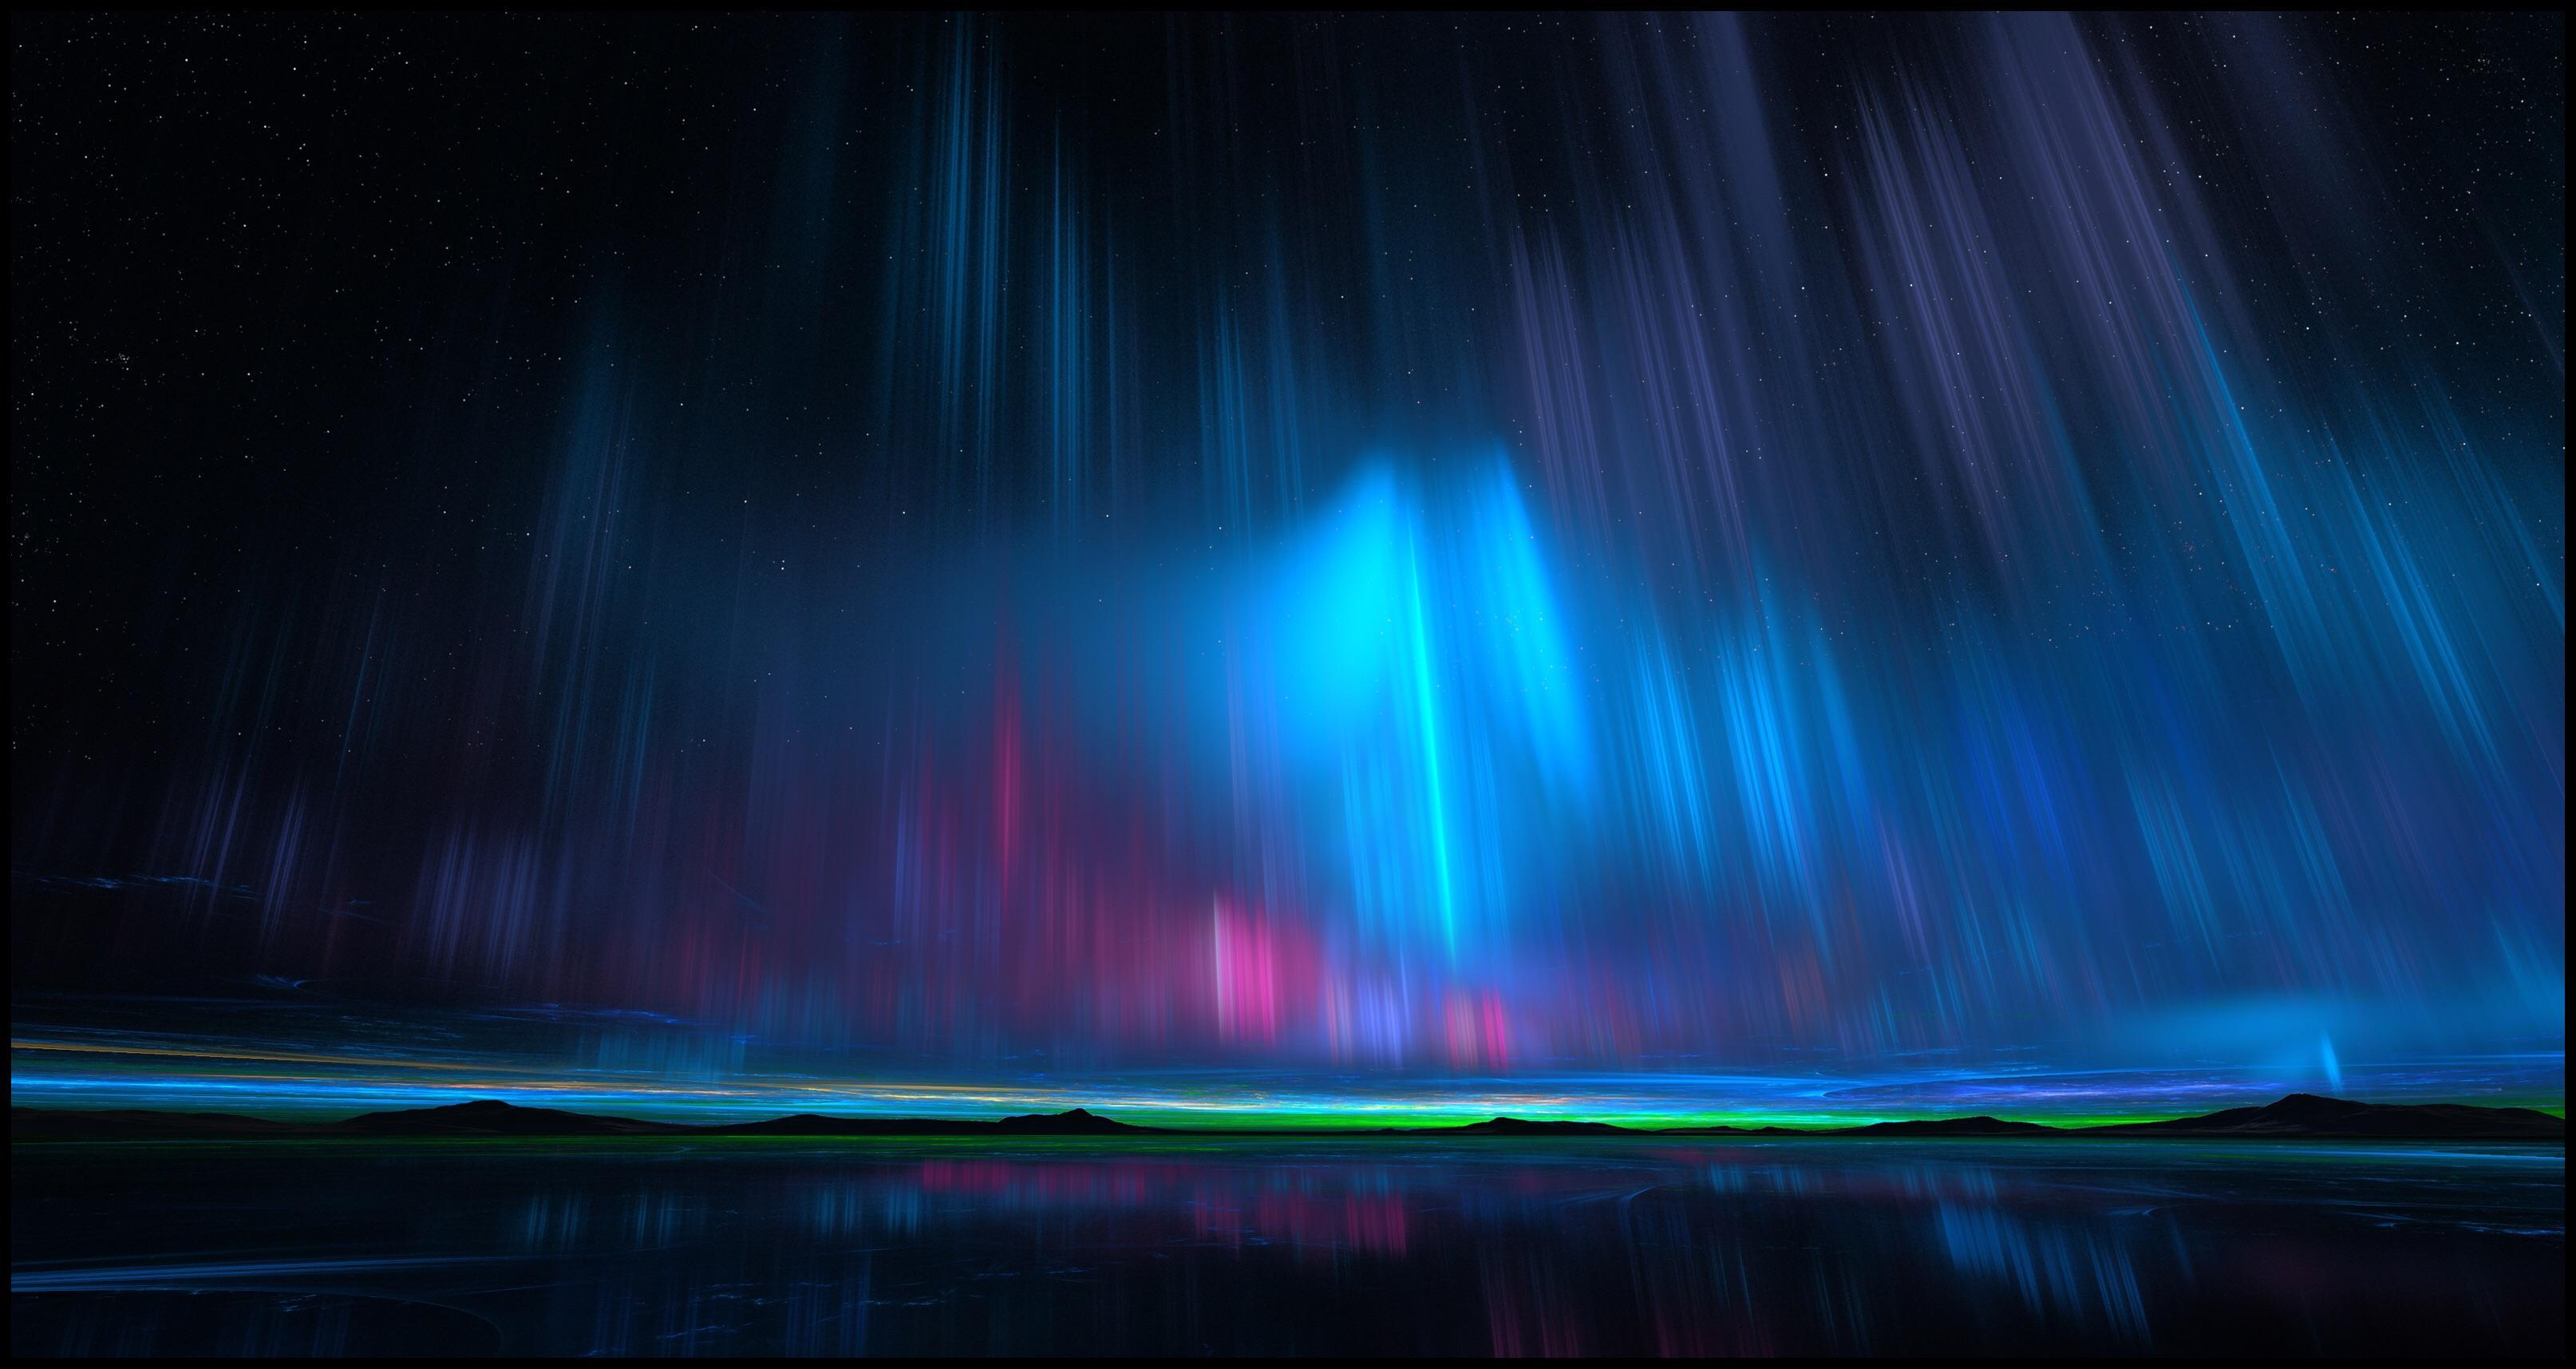 General 3228x1715 landscape mountains aurorae night space digital art